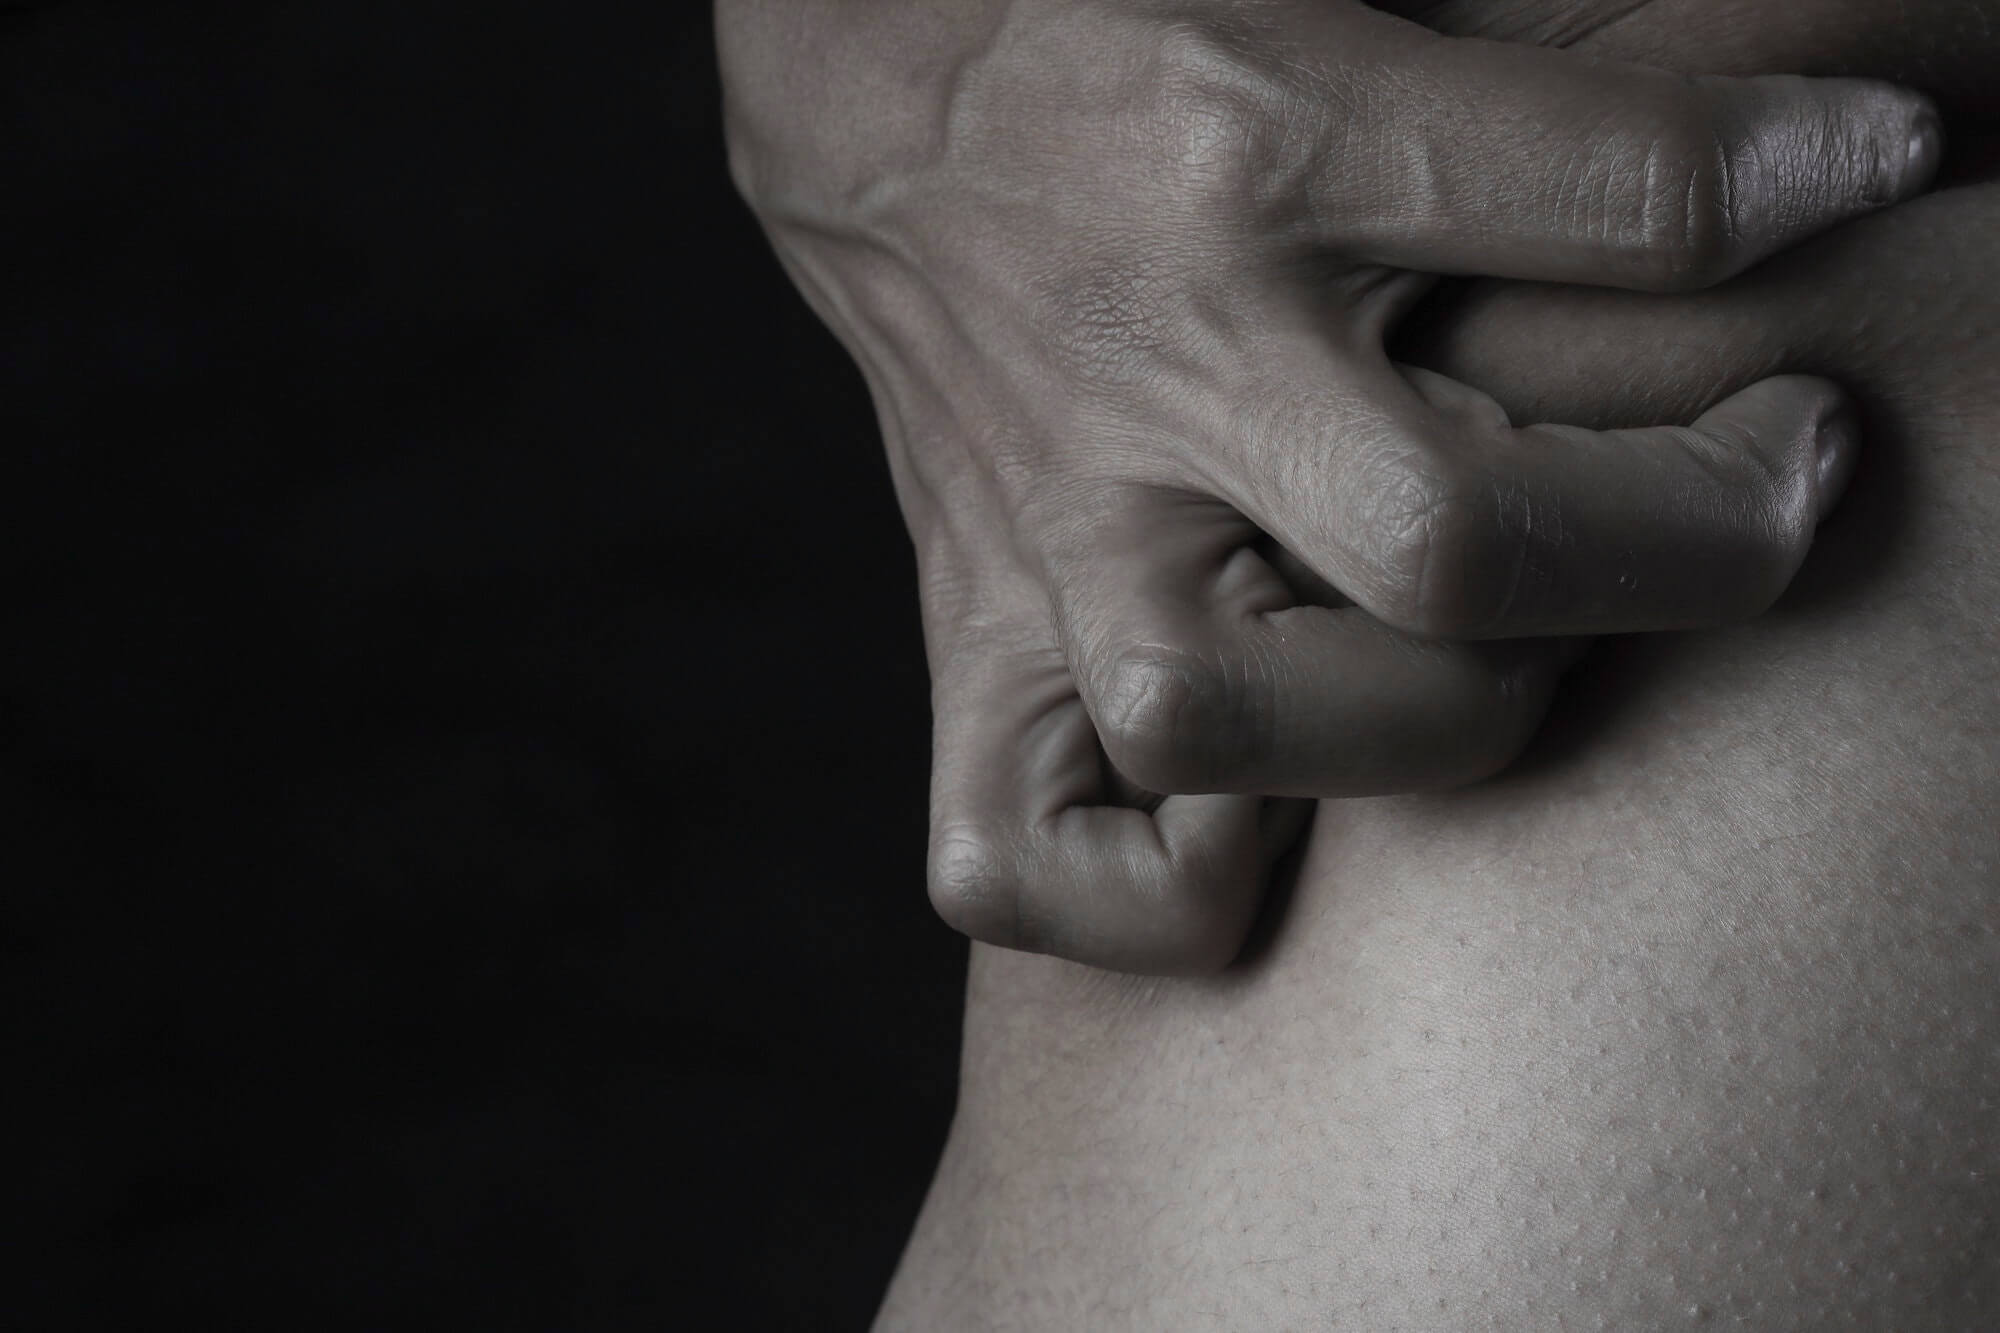 fibromyalgia-pain-relief